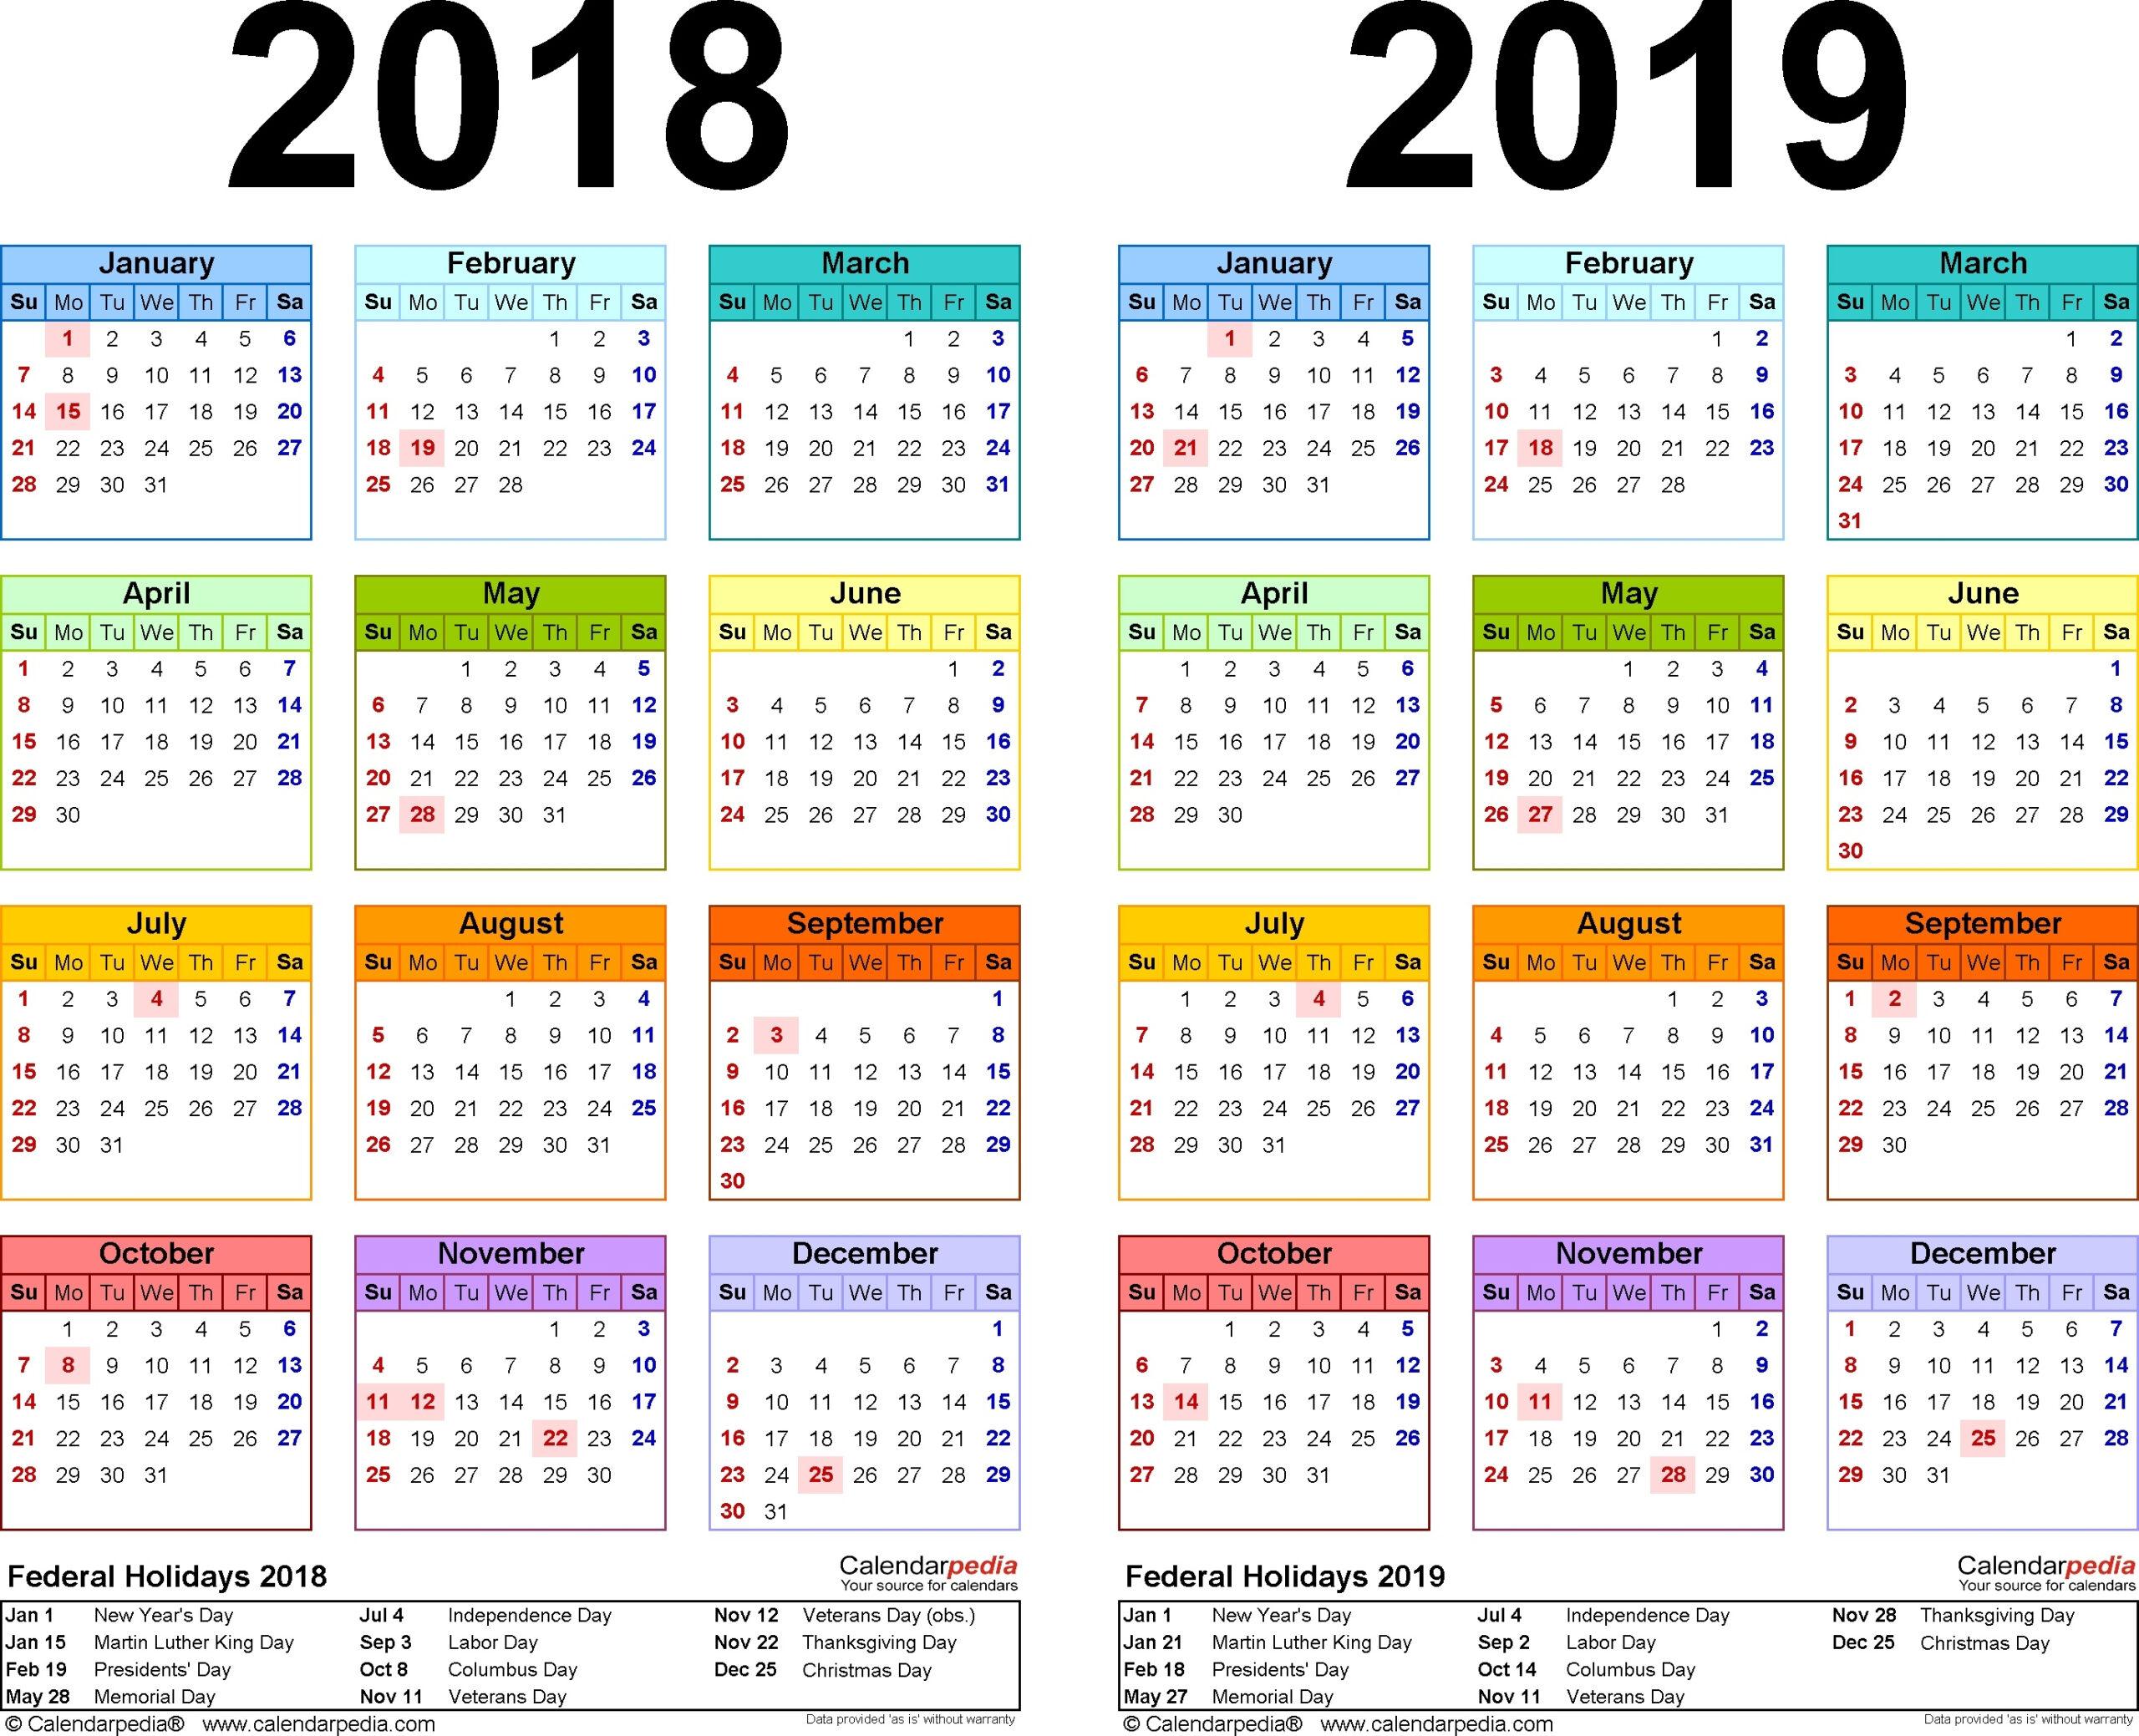 Canadian Holidays 2018/2019 Calendar Printable – Template